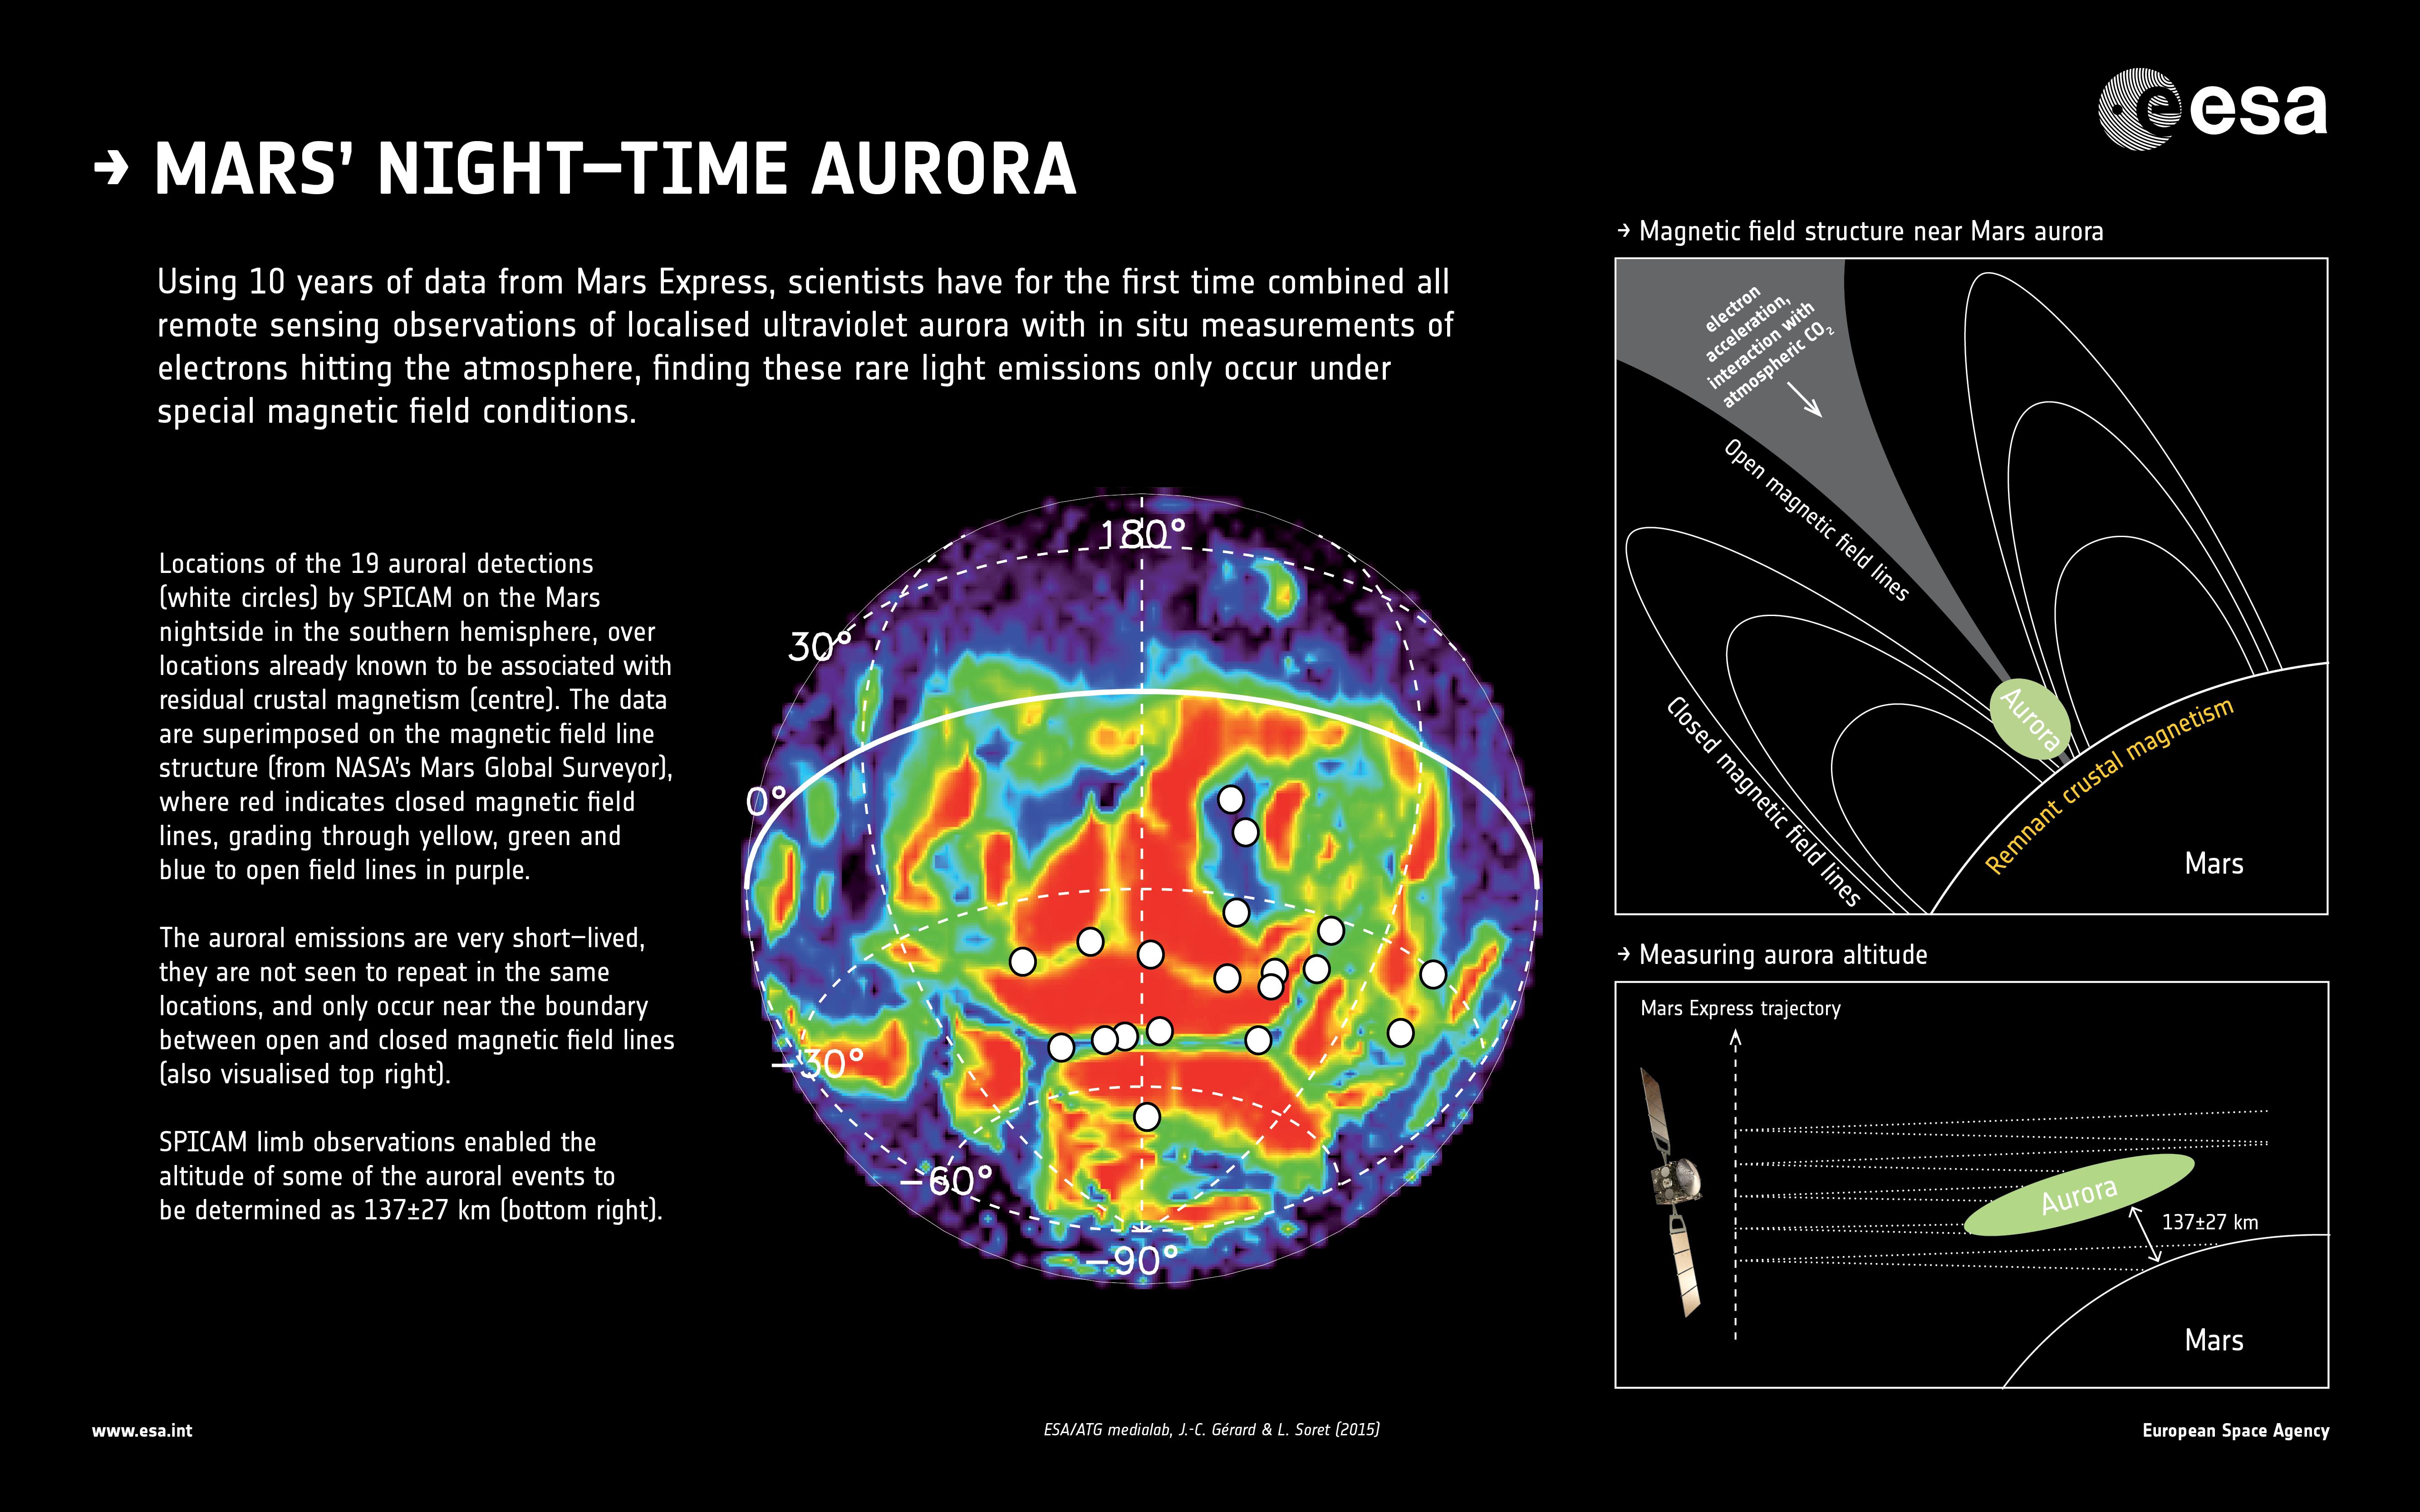 Mars_night-time_aurora